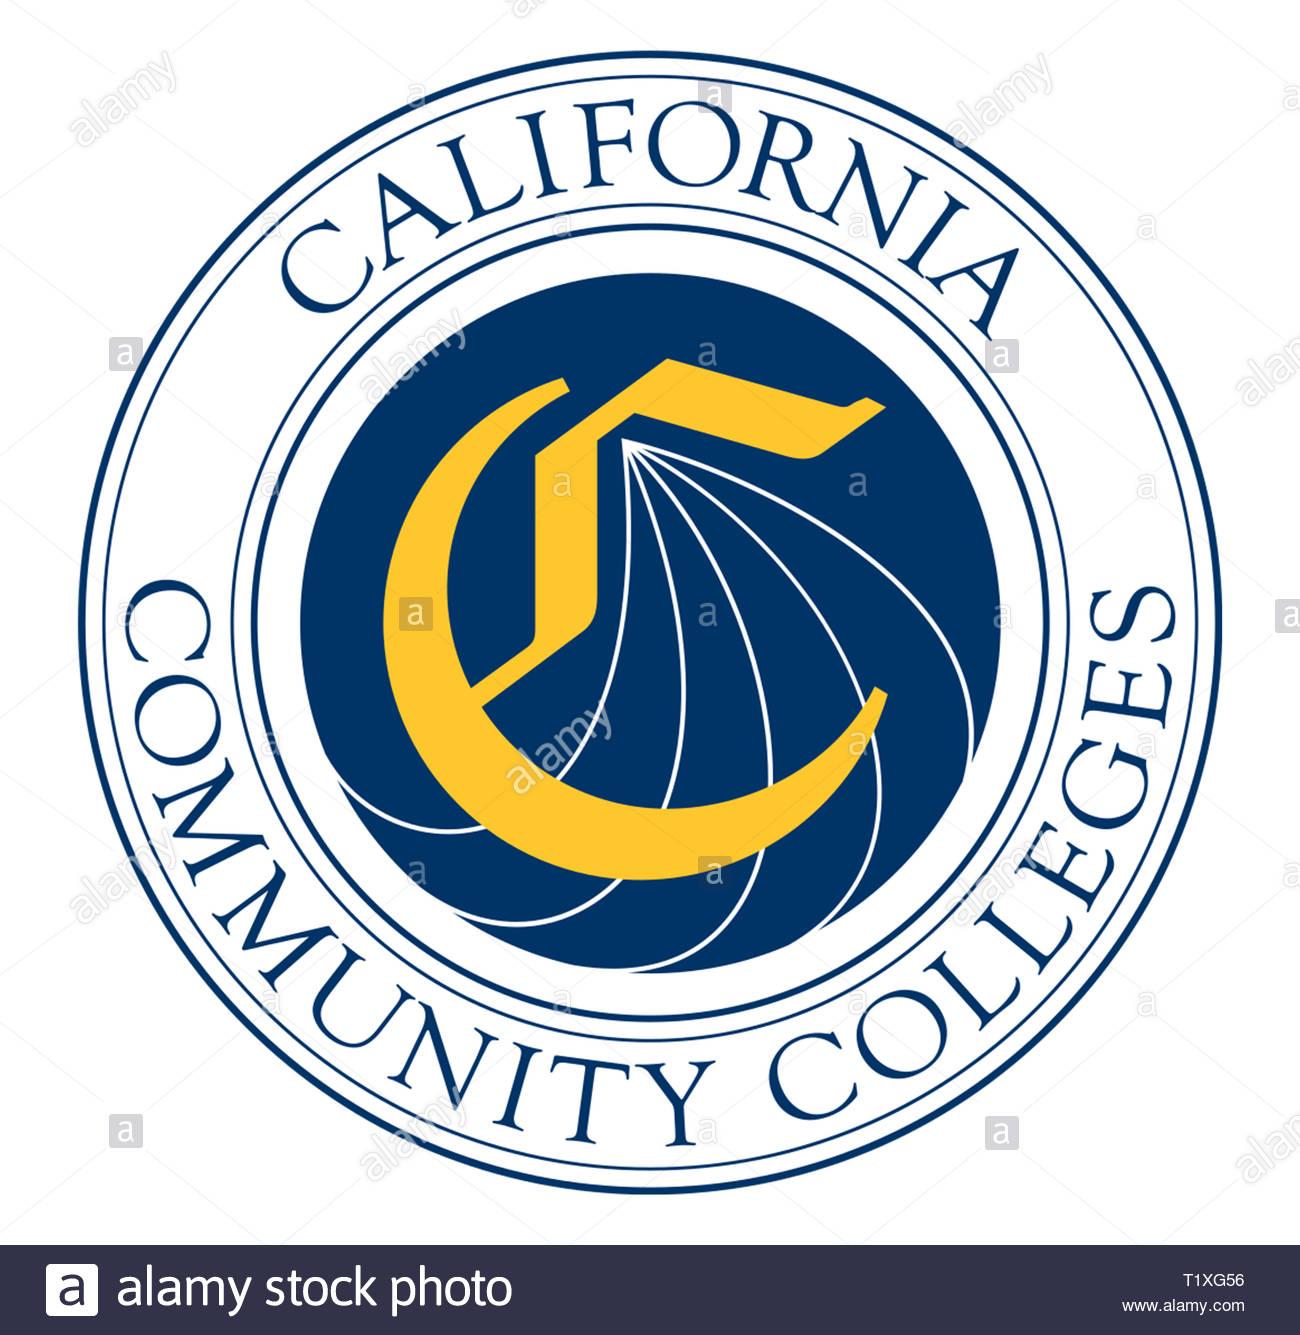 CCS California Community Colleges icon logo - Stock Image